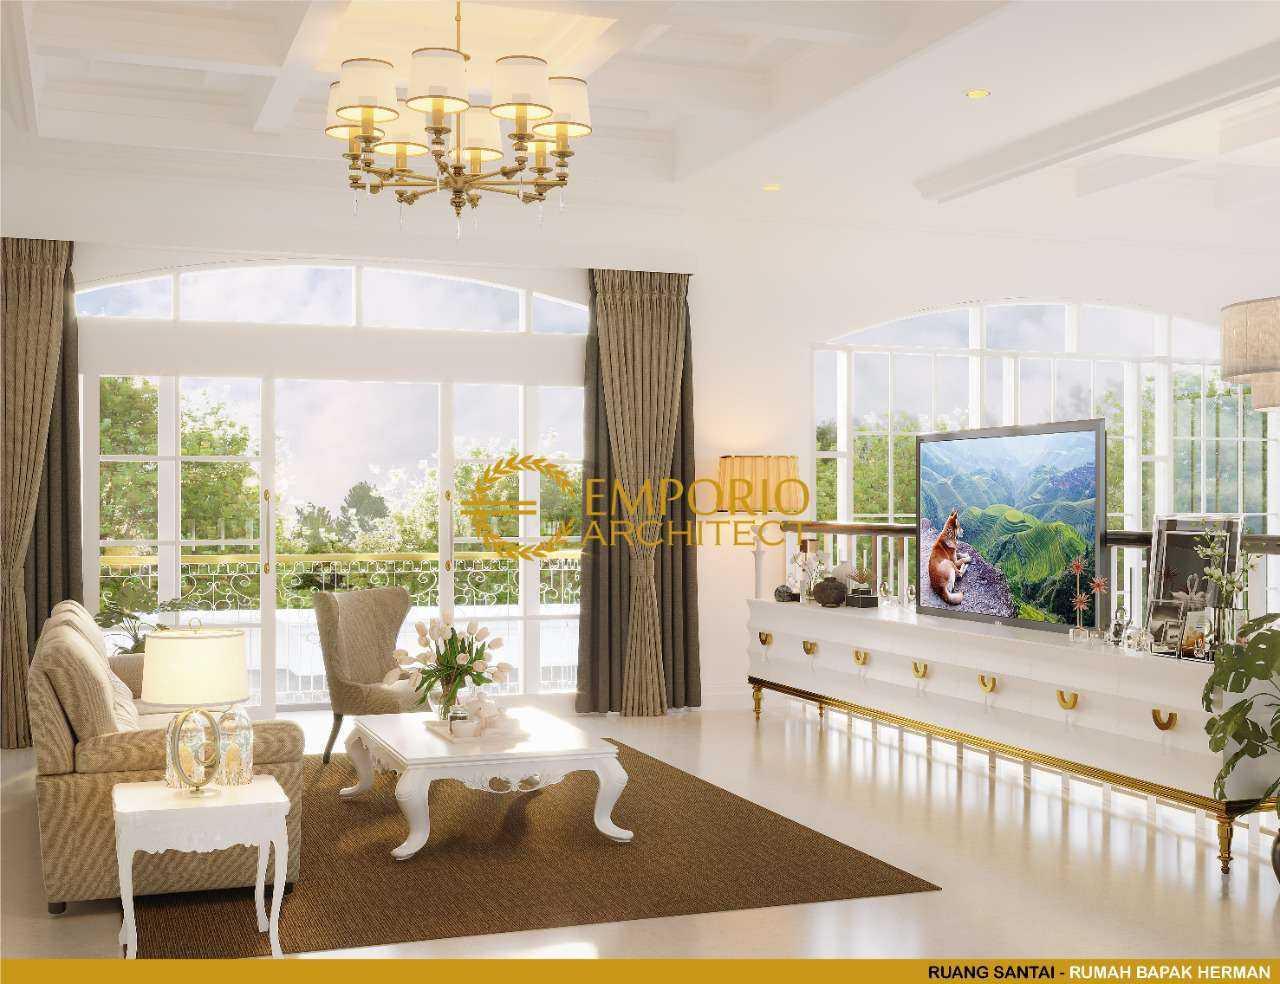 Emporio Architect Jasa Arsitek Denpasar Desain Rumah Classic 3 Lantai 772 @ Denpasar, Bali Kota Denpasar, Bali, Indonesia Kota Denpasar, Bali, Indonesia Emporio-Architect-Jasa-Arsitek-Denpasar-Desain-Rumah-Classic-3-Lantai-350-Denpasar-Bali  94566